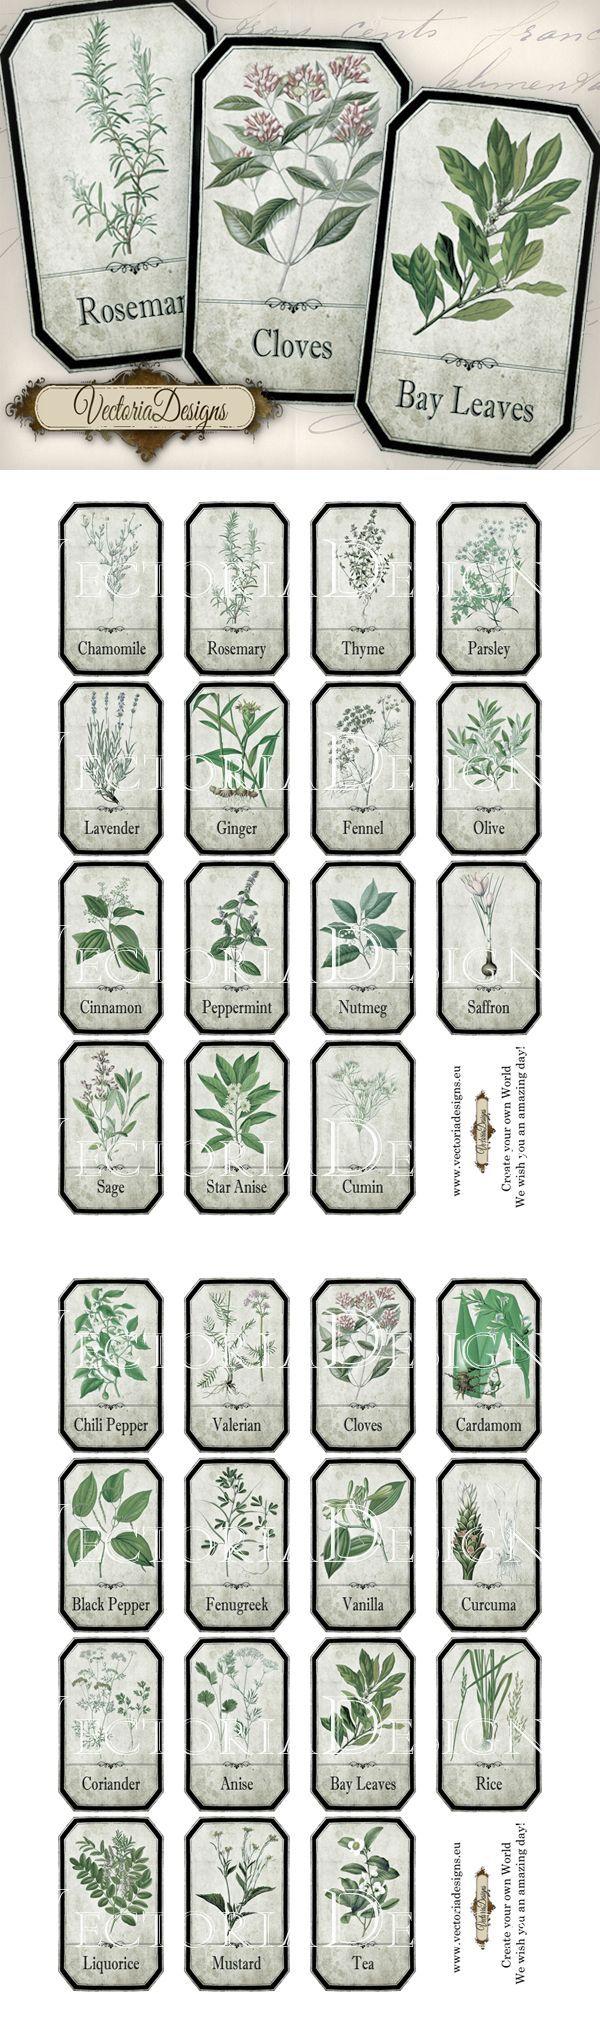 Printable Shabby Herbal Labels by VectoriaDesigns.deviantart.com on @deviantART | herbology, herbalism, healing plants, herbal medicine